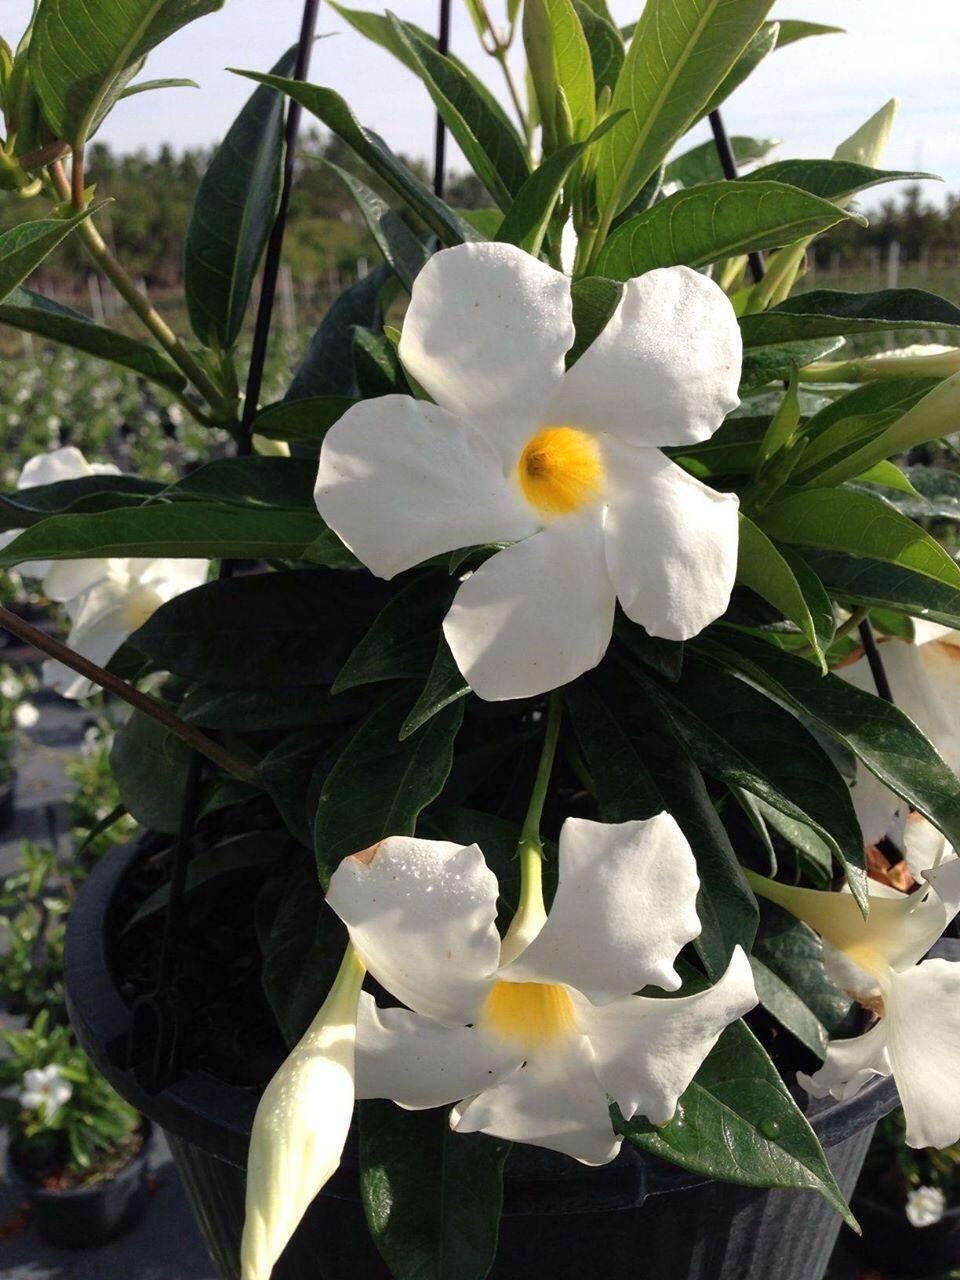 Mandevilla white with yellow center plants flower